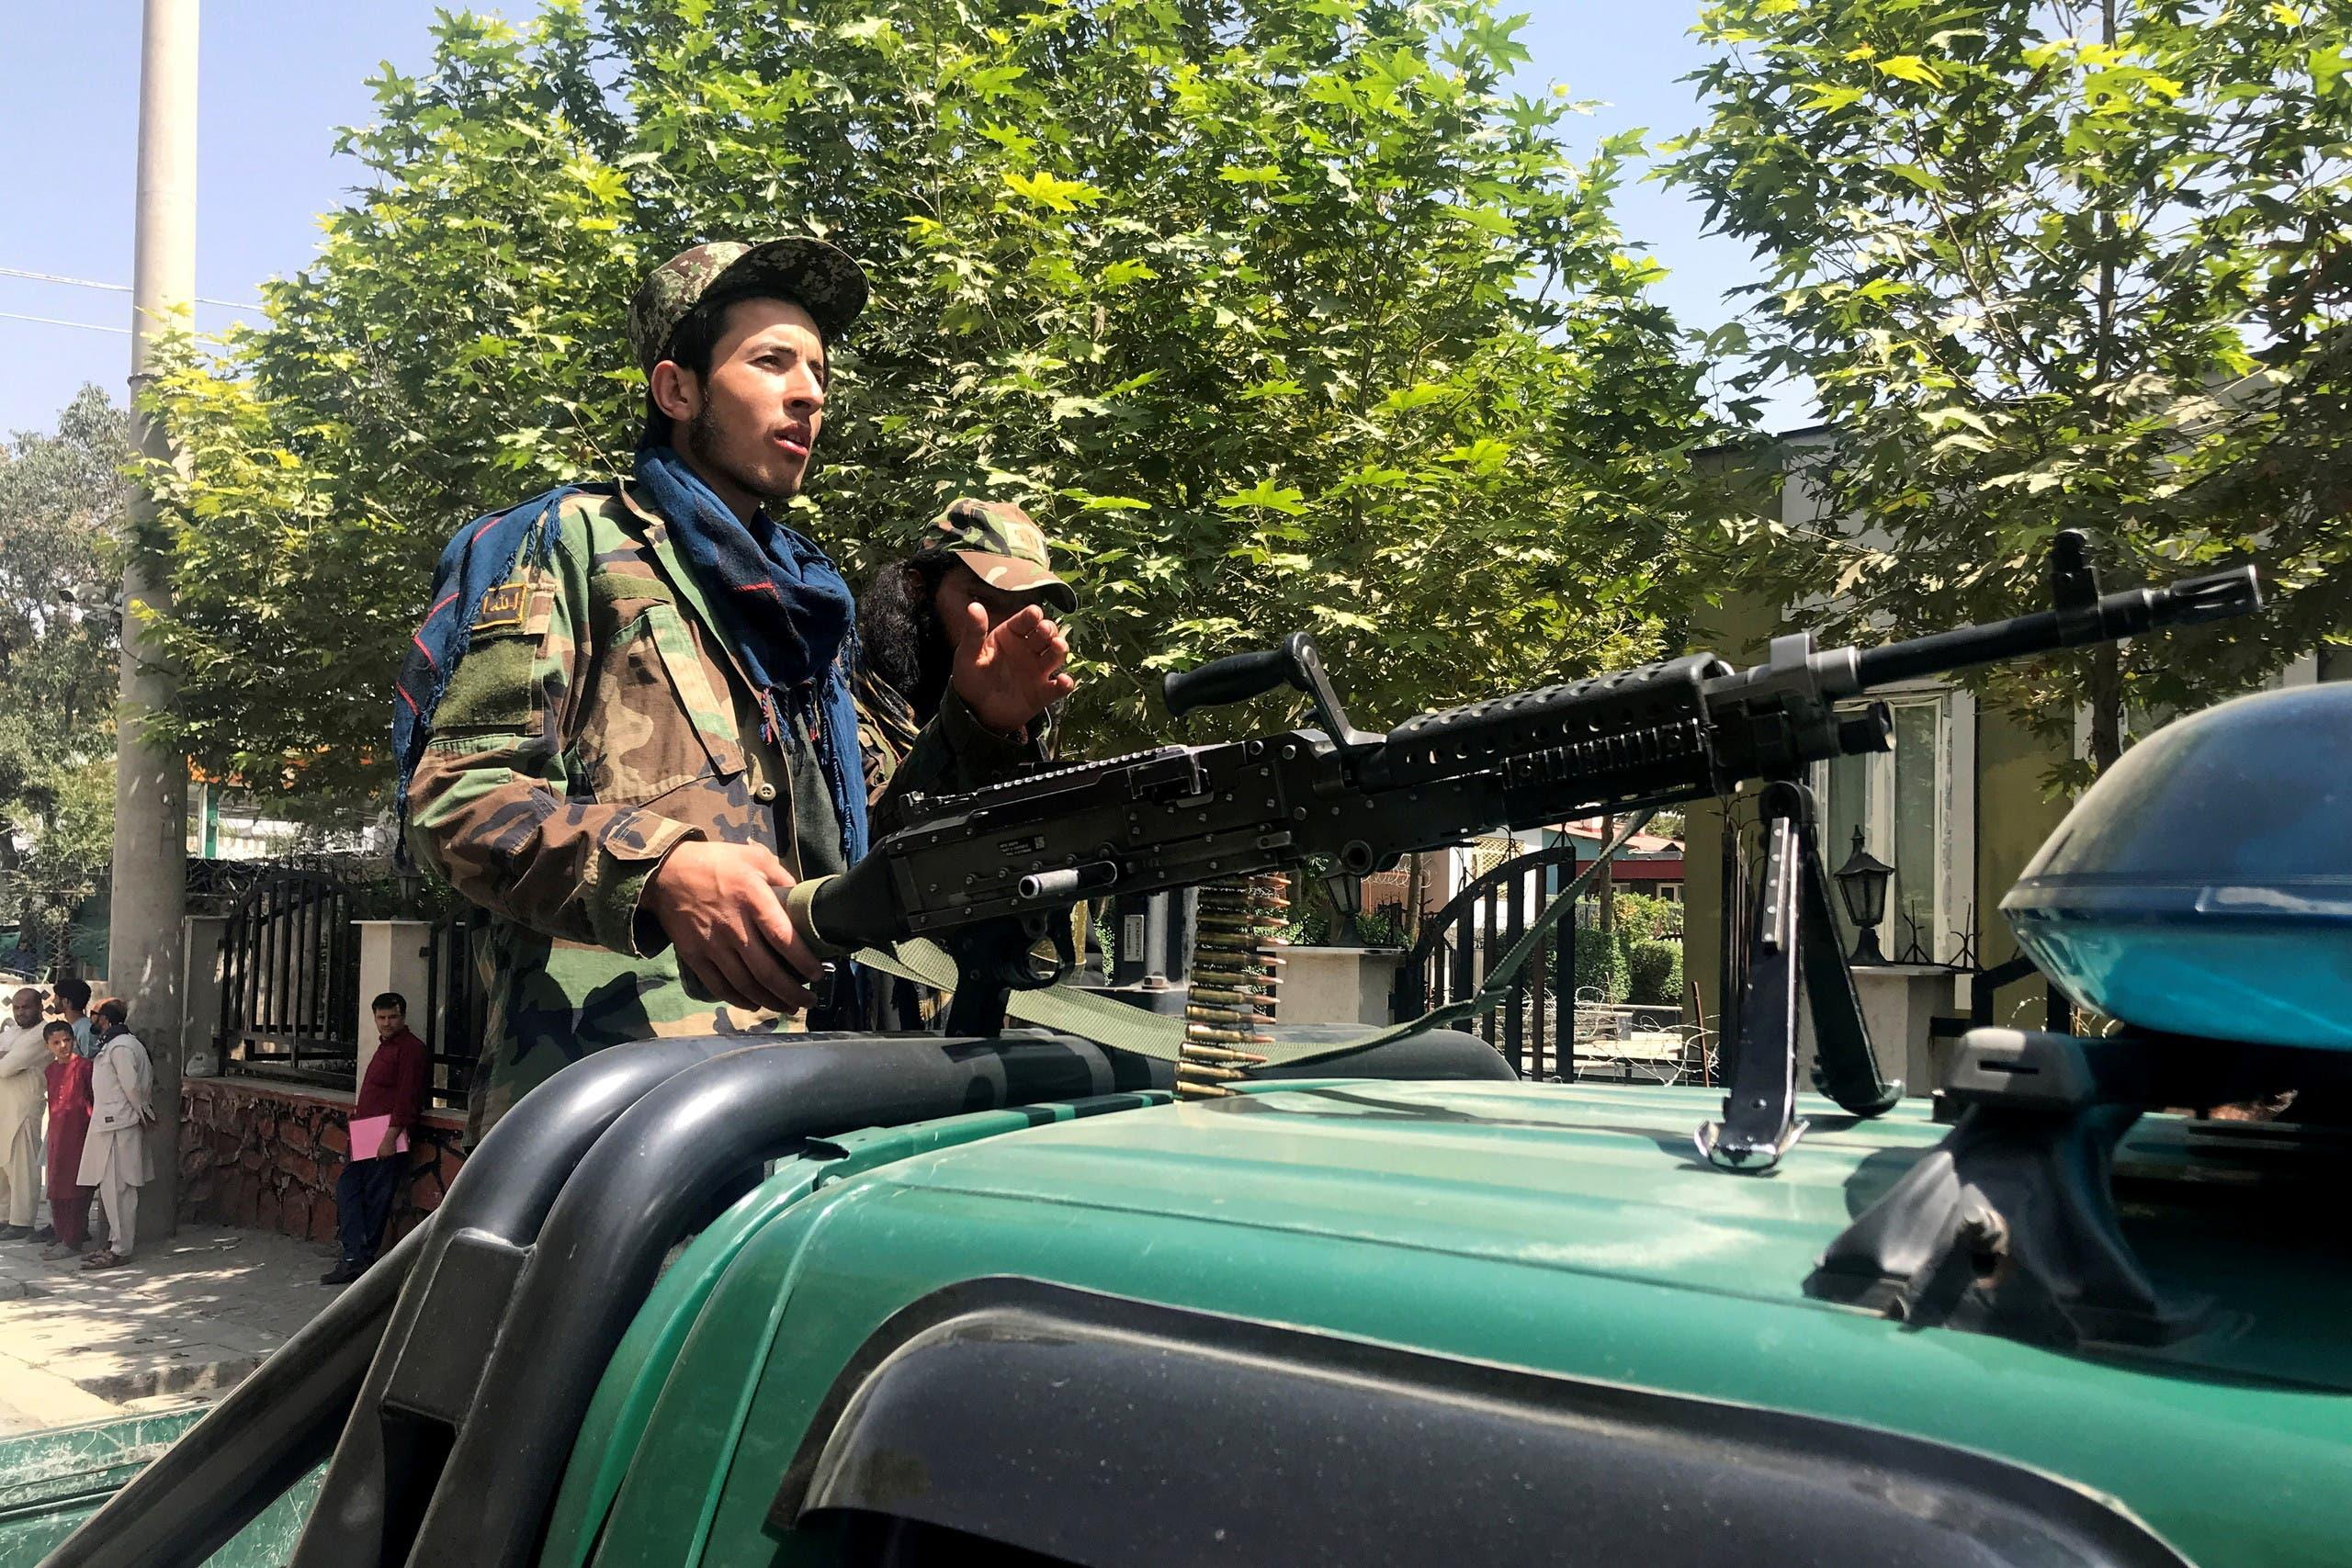 Taliban forces patrol in Kabul, Afghanistan, August 16, 2021. (Reuters)